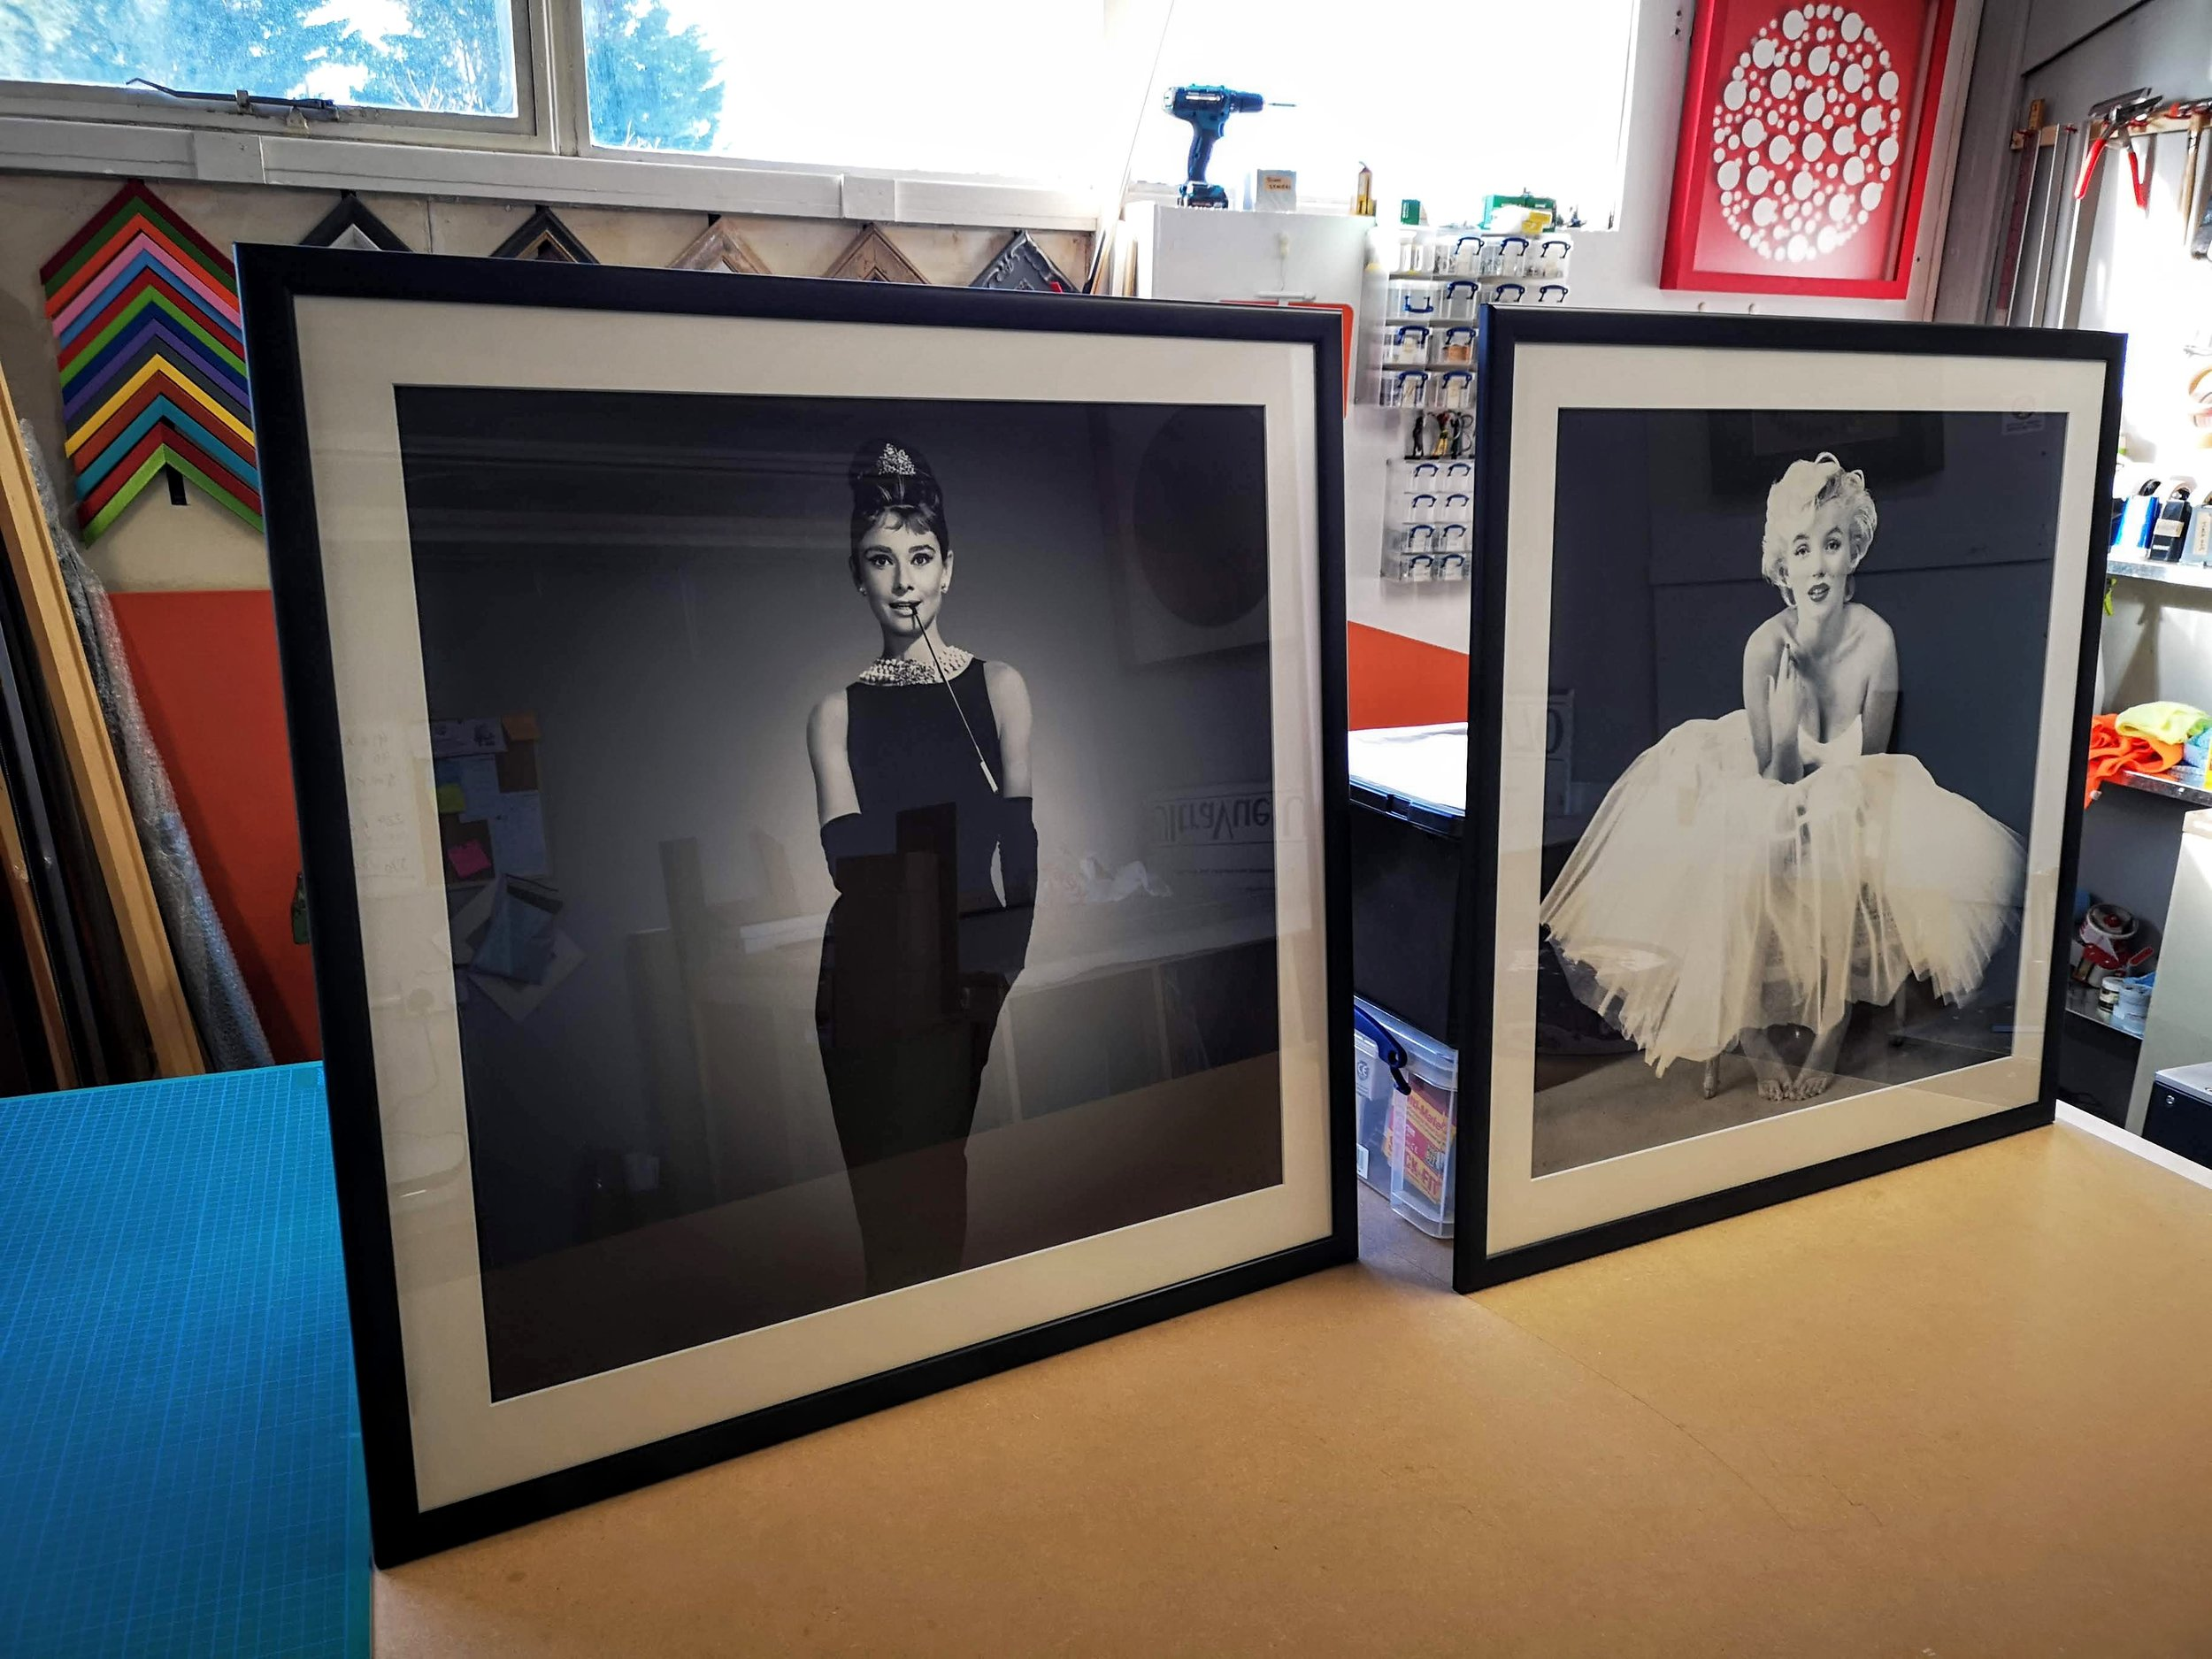 audrey hepburn marilyn monroe prints framed